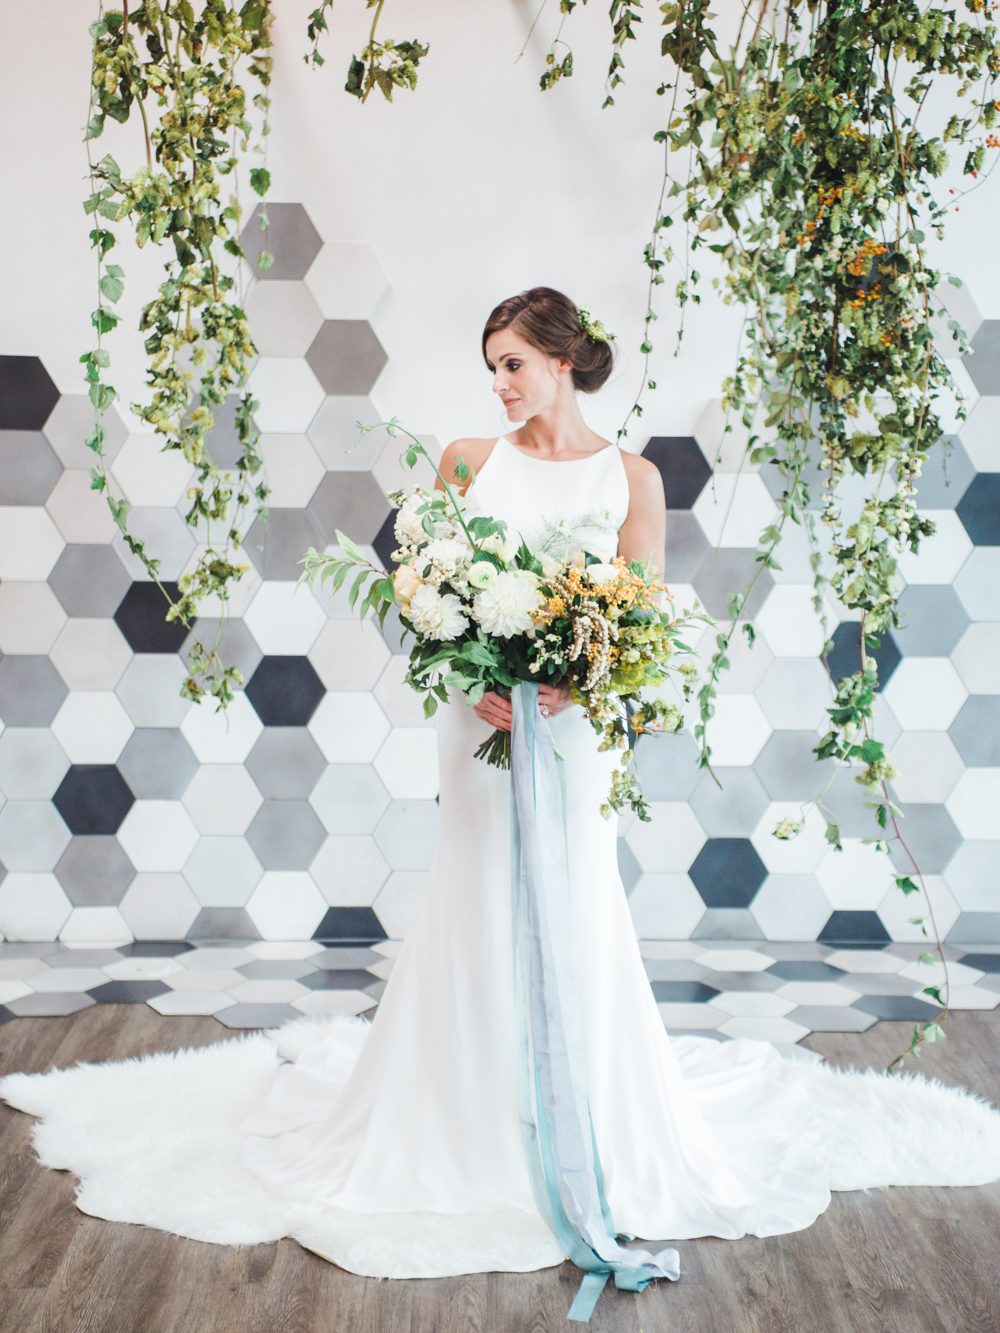 teal_modern-romantic-orange-industiral-wedding-inspiration34